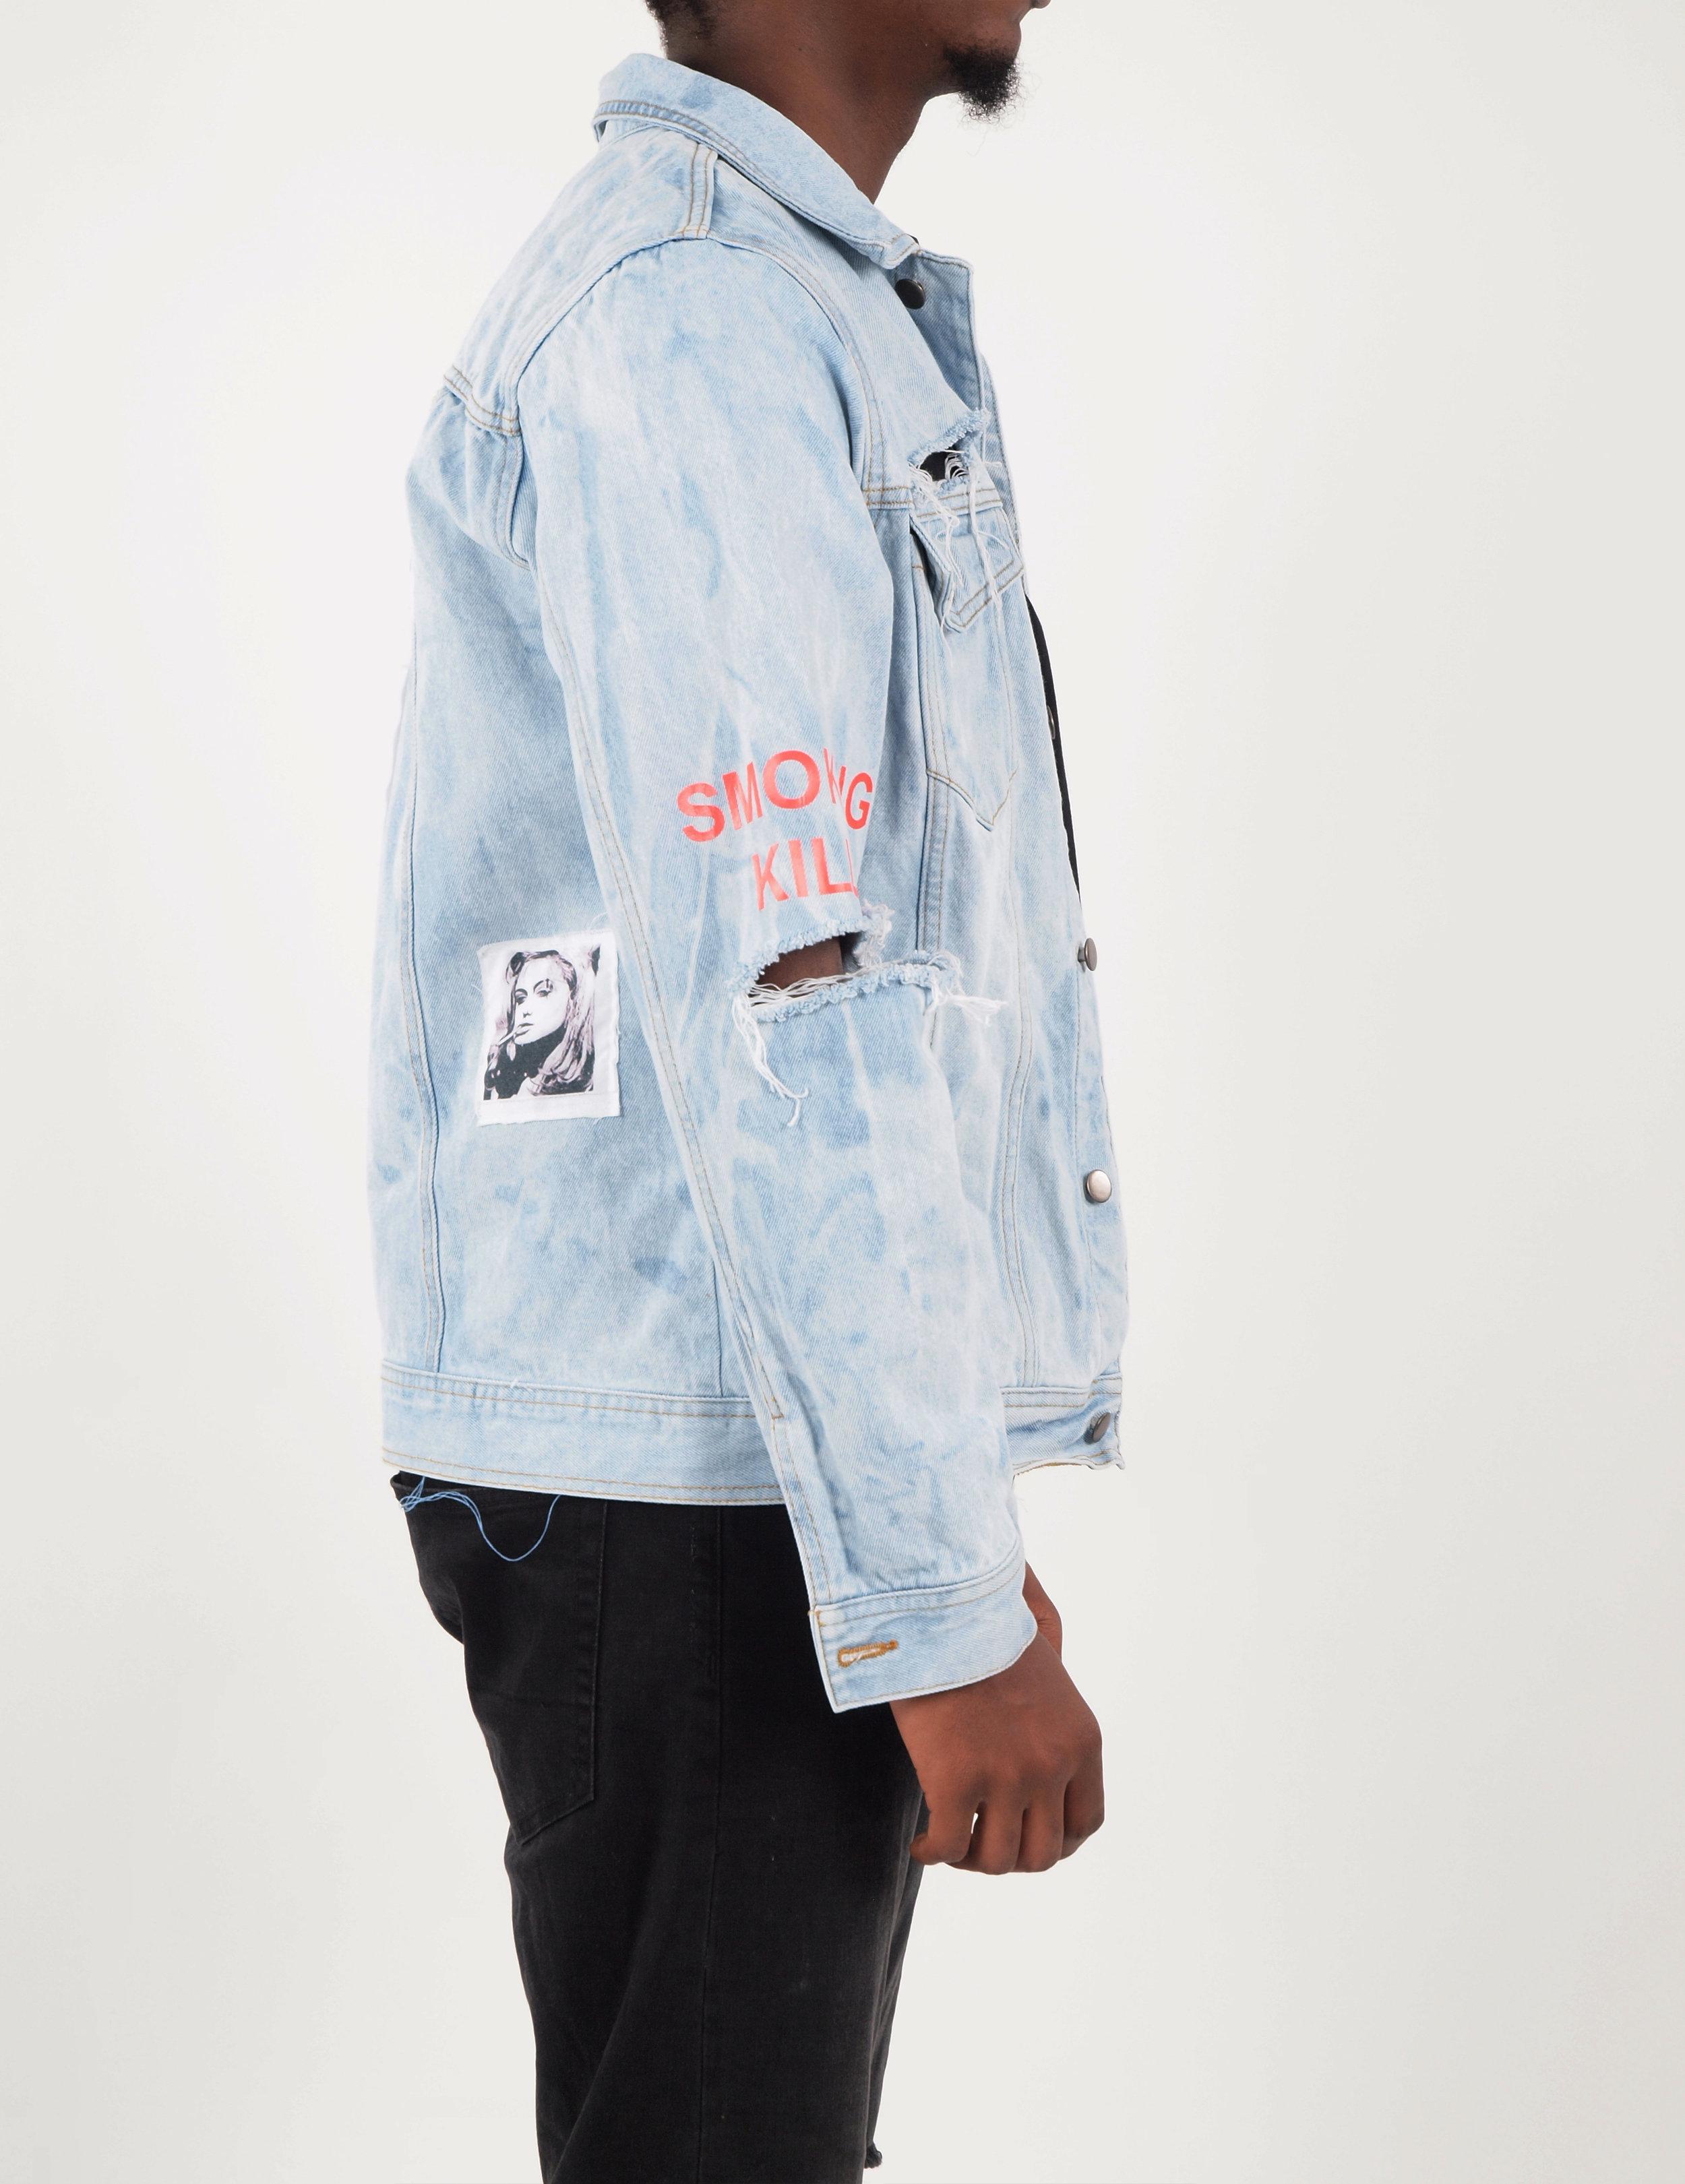 textured blue denim jacket side 2.jpg